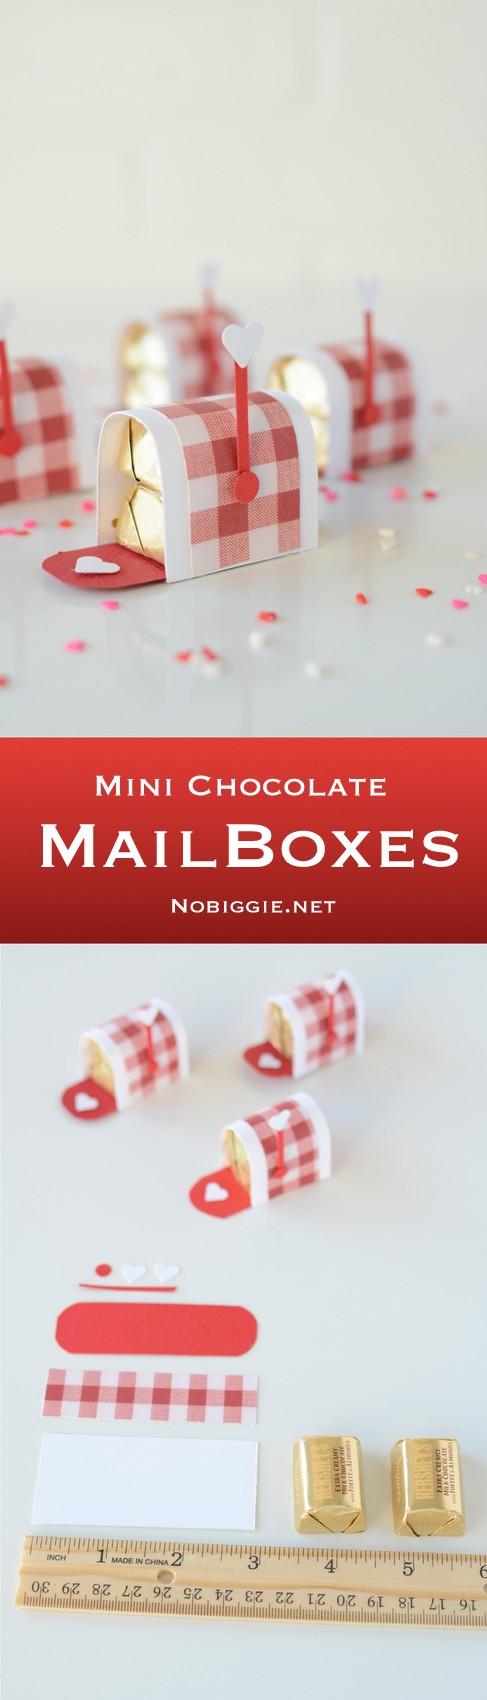 Mini Chocolate Mailboxes Nobiggie